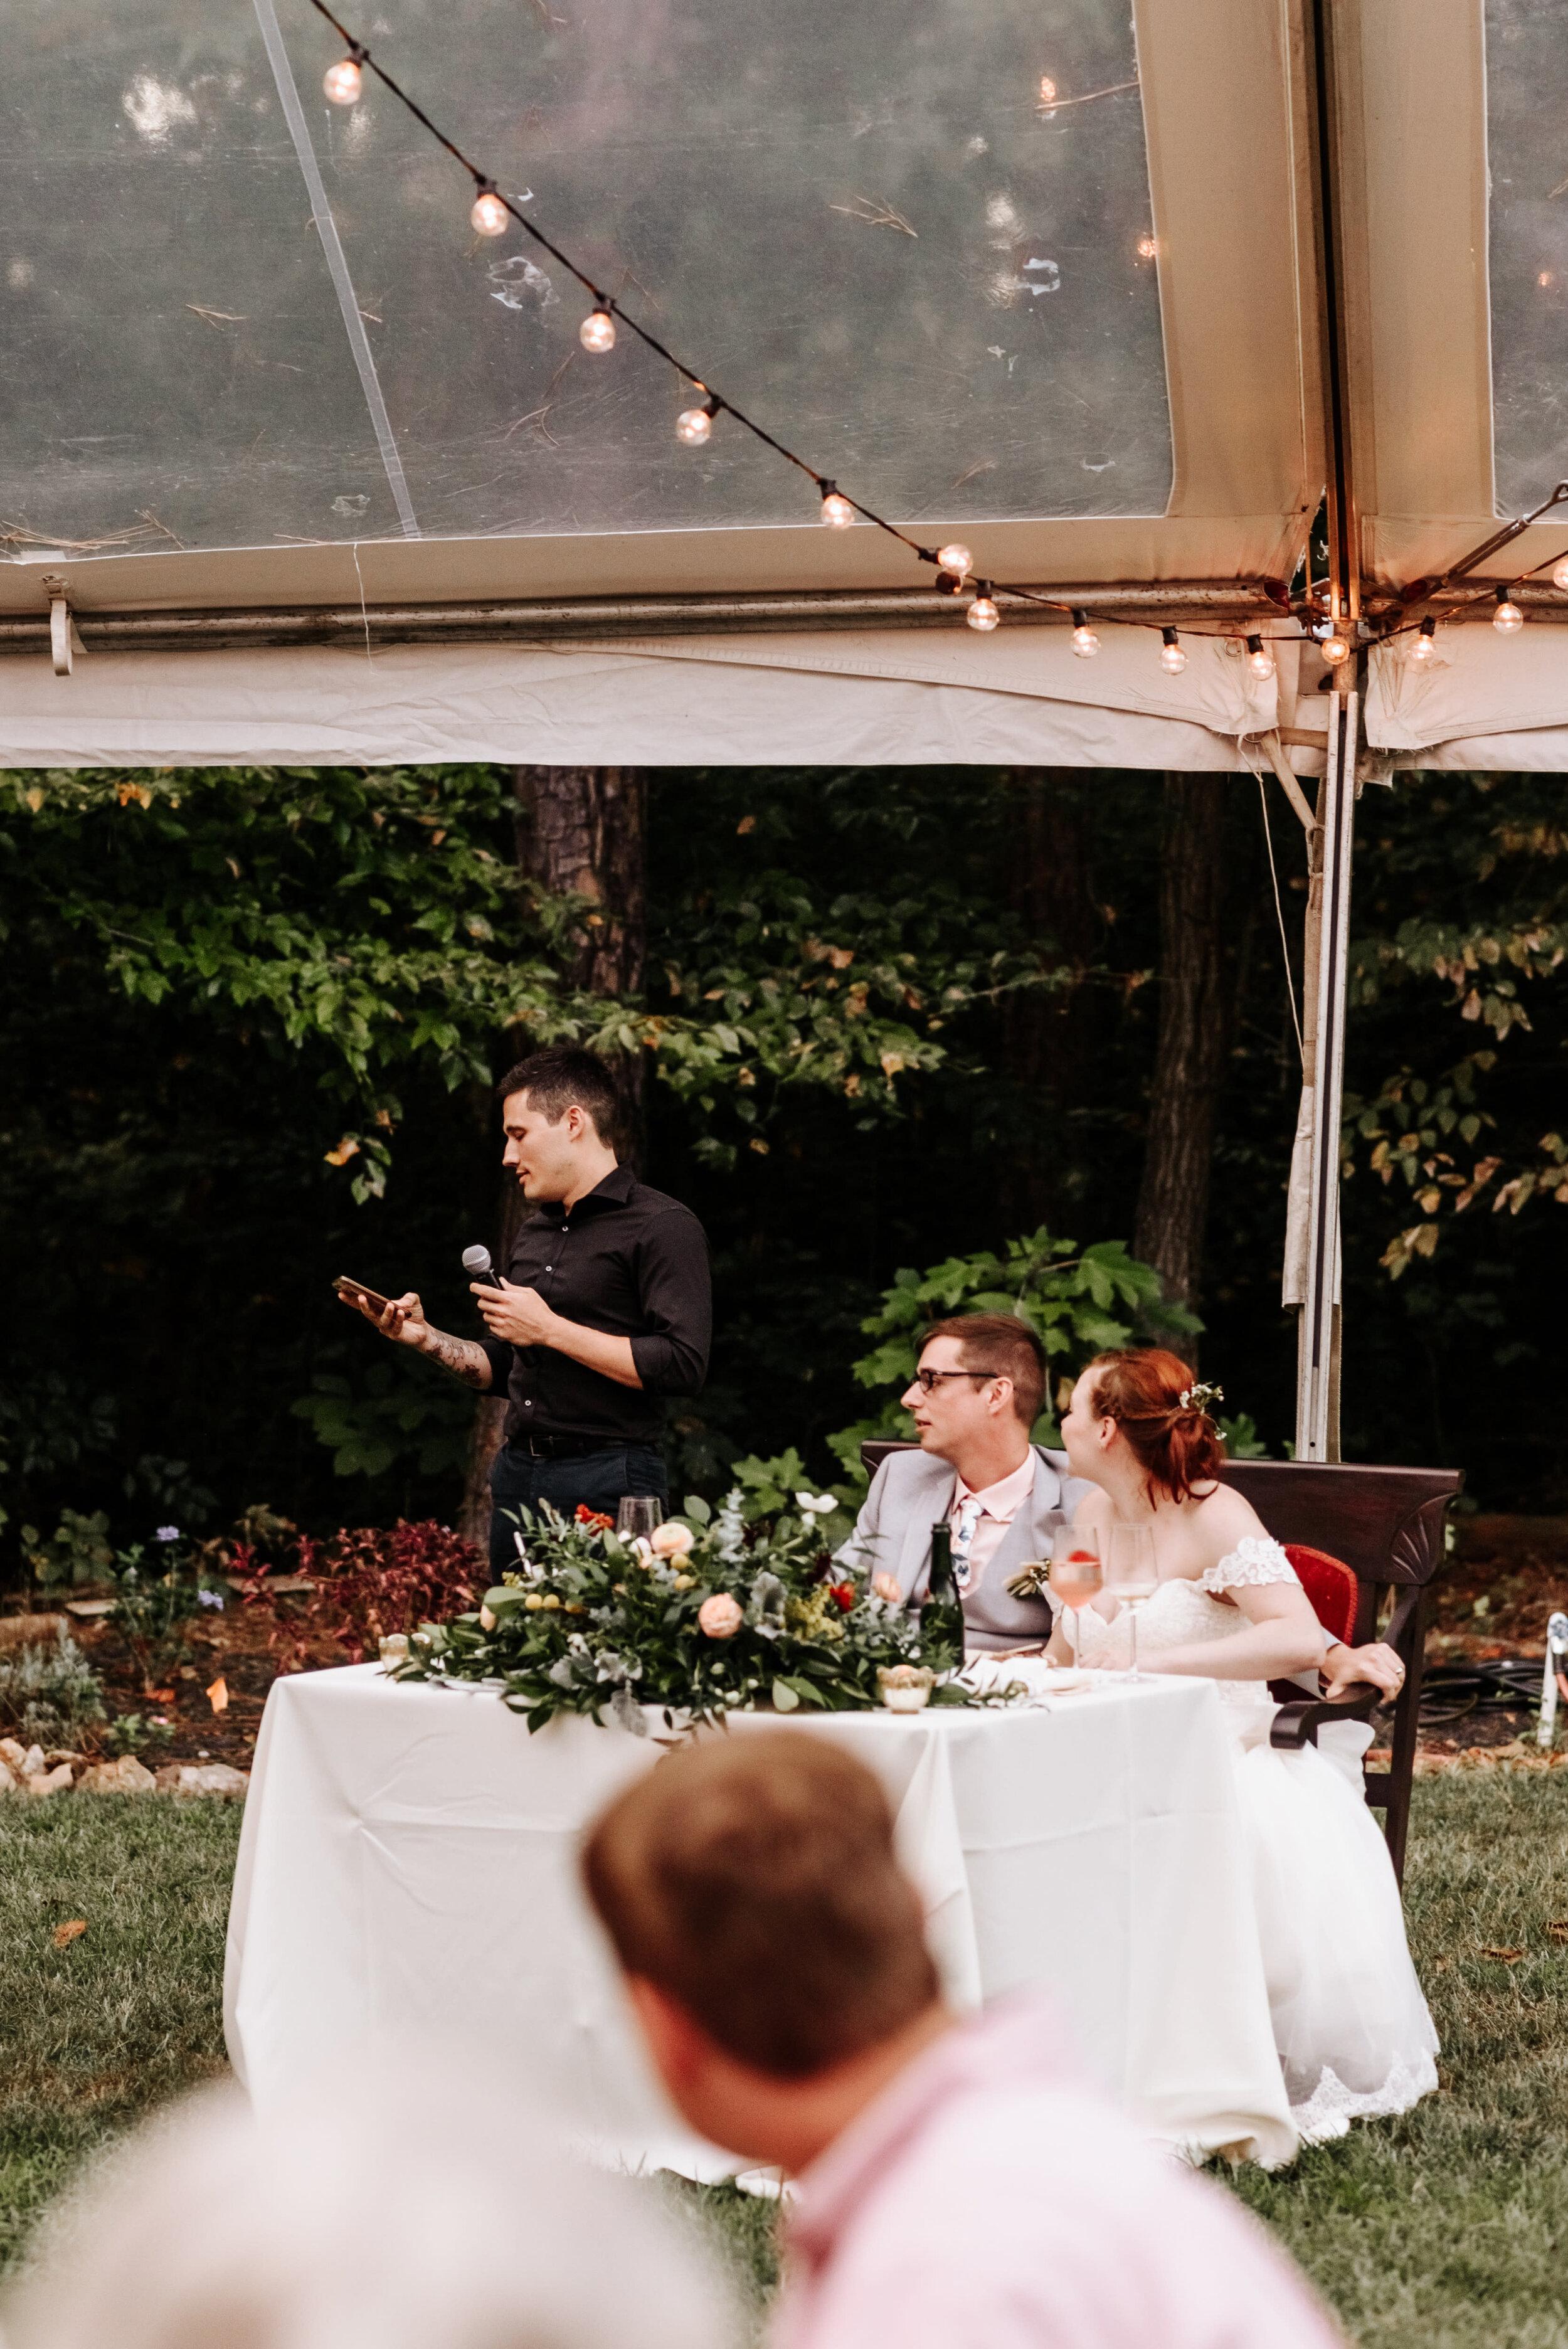 Rachel_David_Wedding_Richmond_Virginia_Photography_by_V_75.jpg